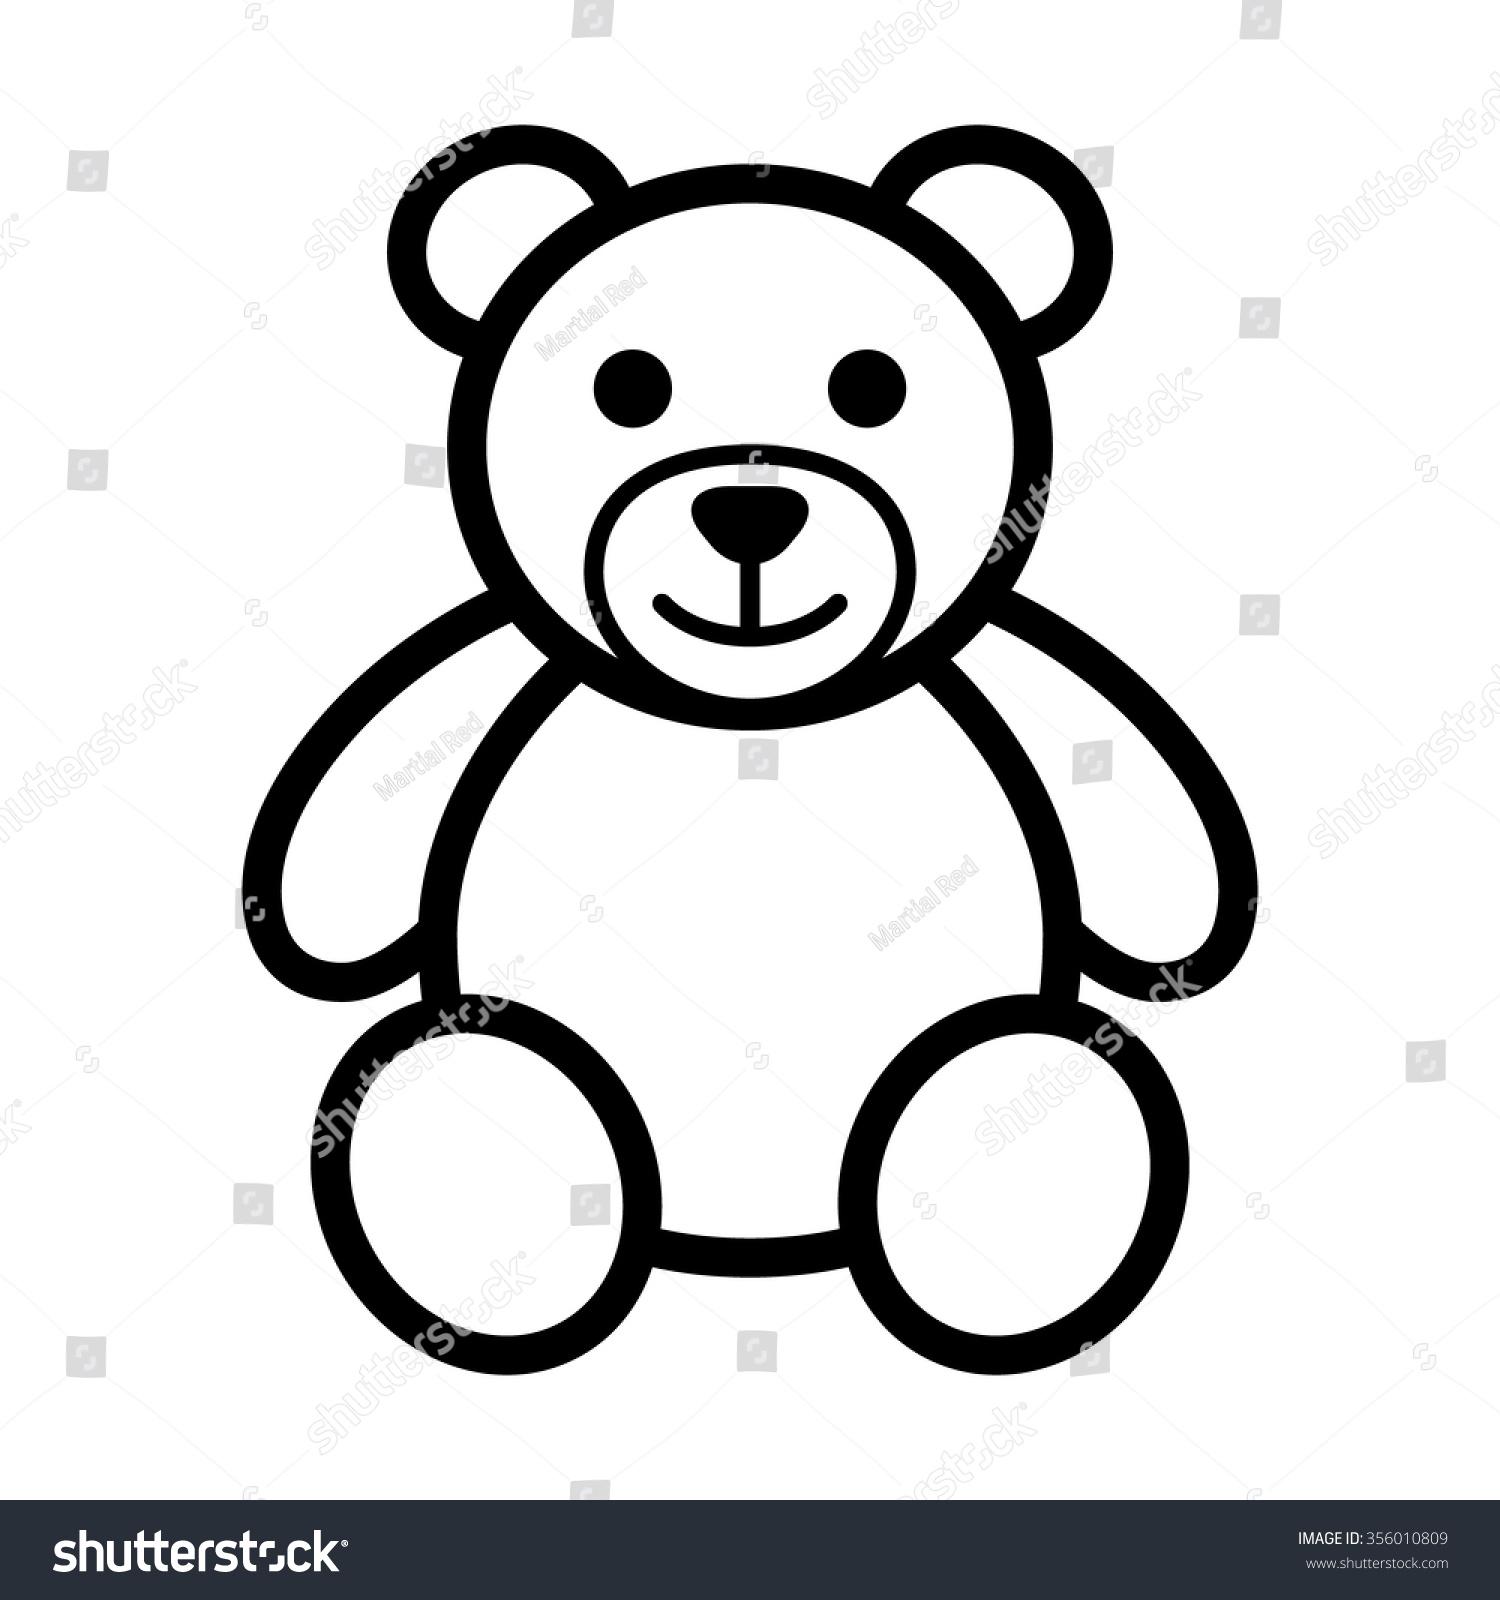 Line Art App : Teddy bear plush toy line art stock vector